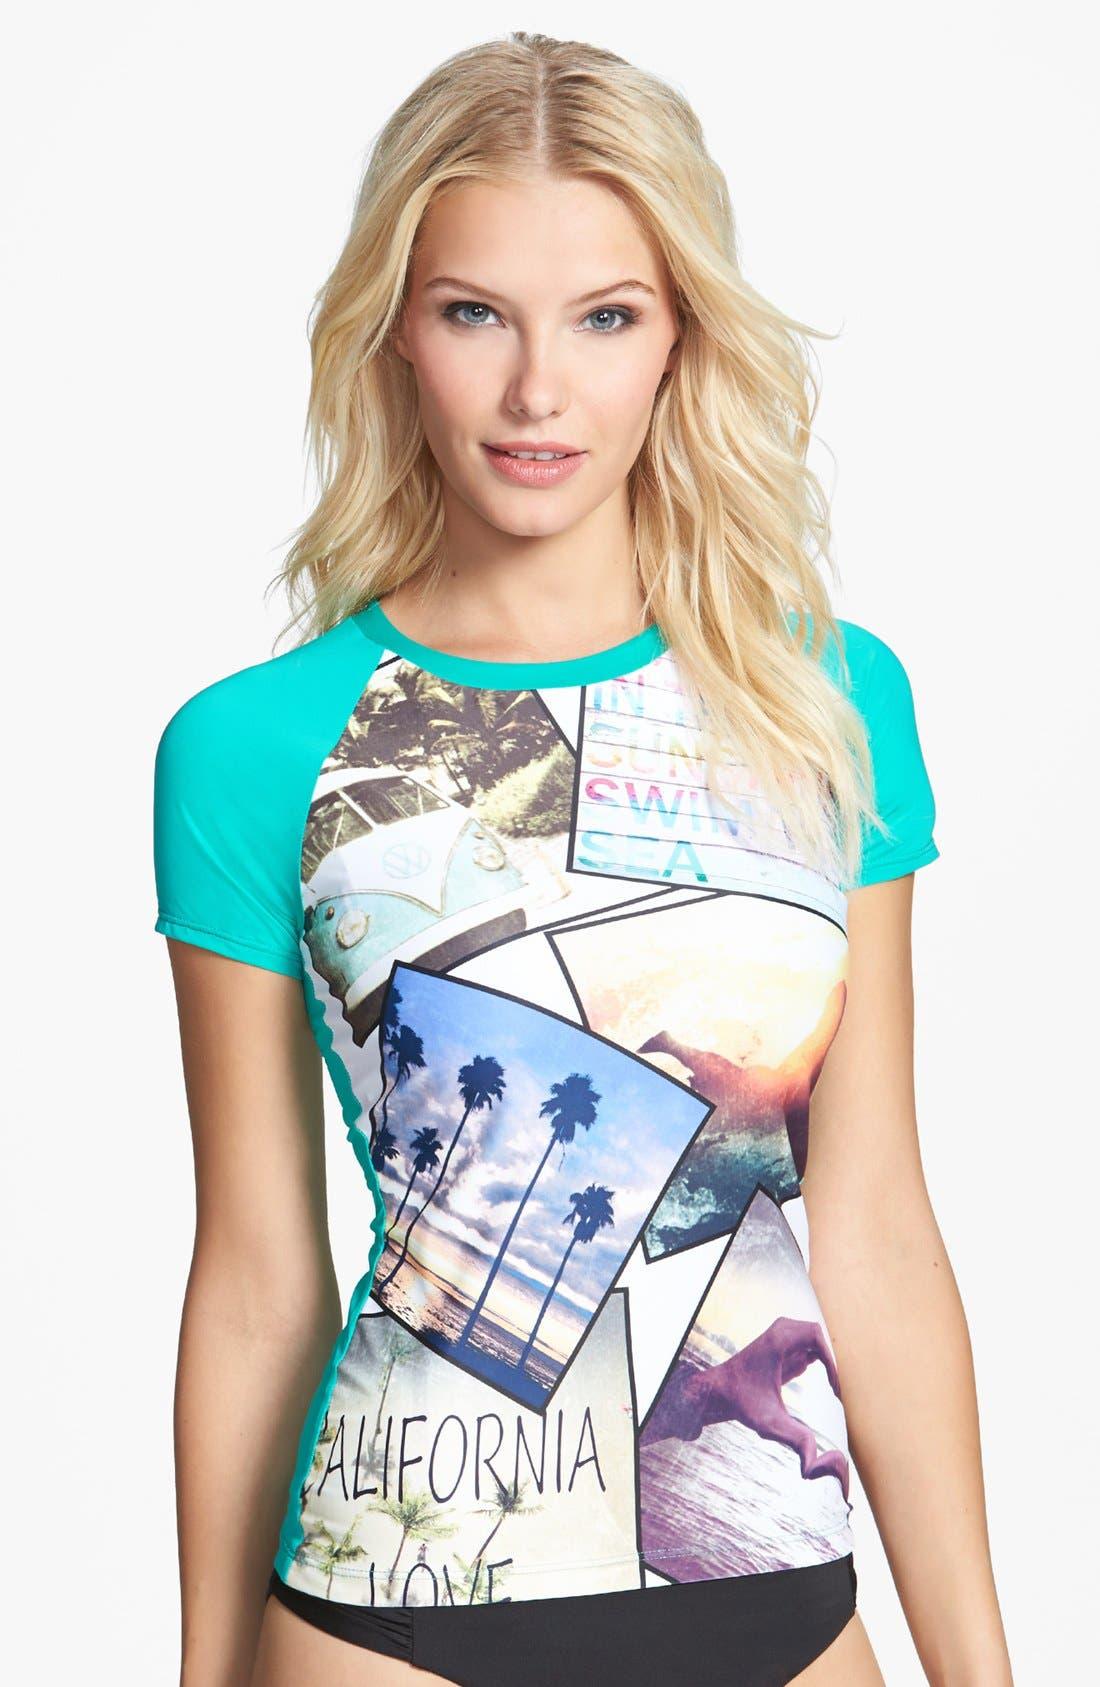 Main Image - W Swimwear 'California Love' Rashguard